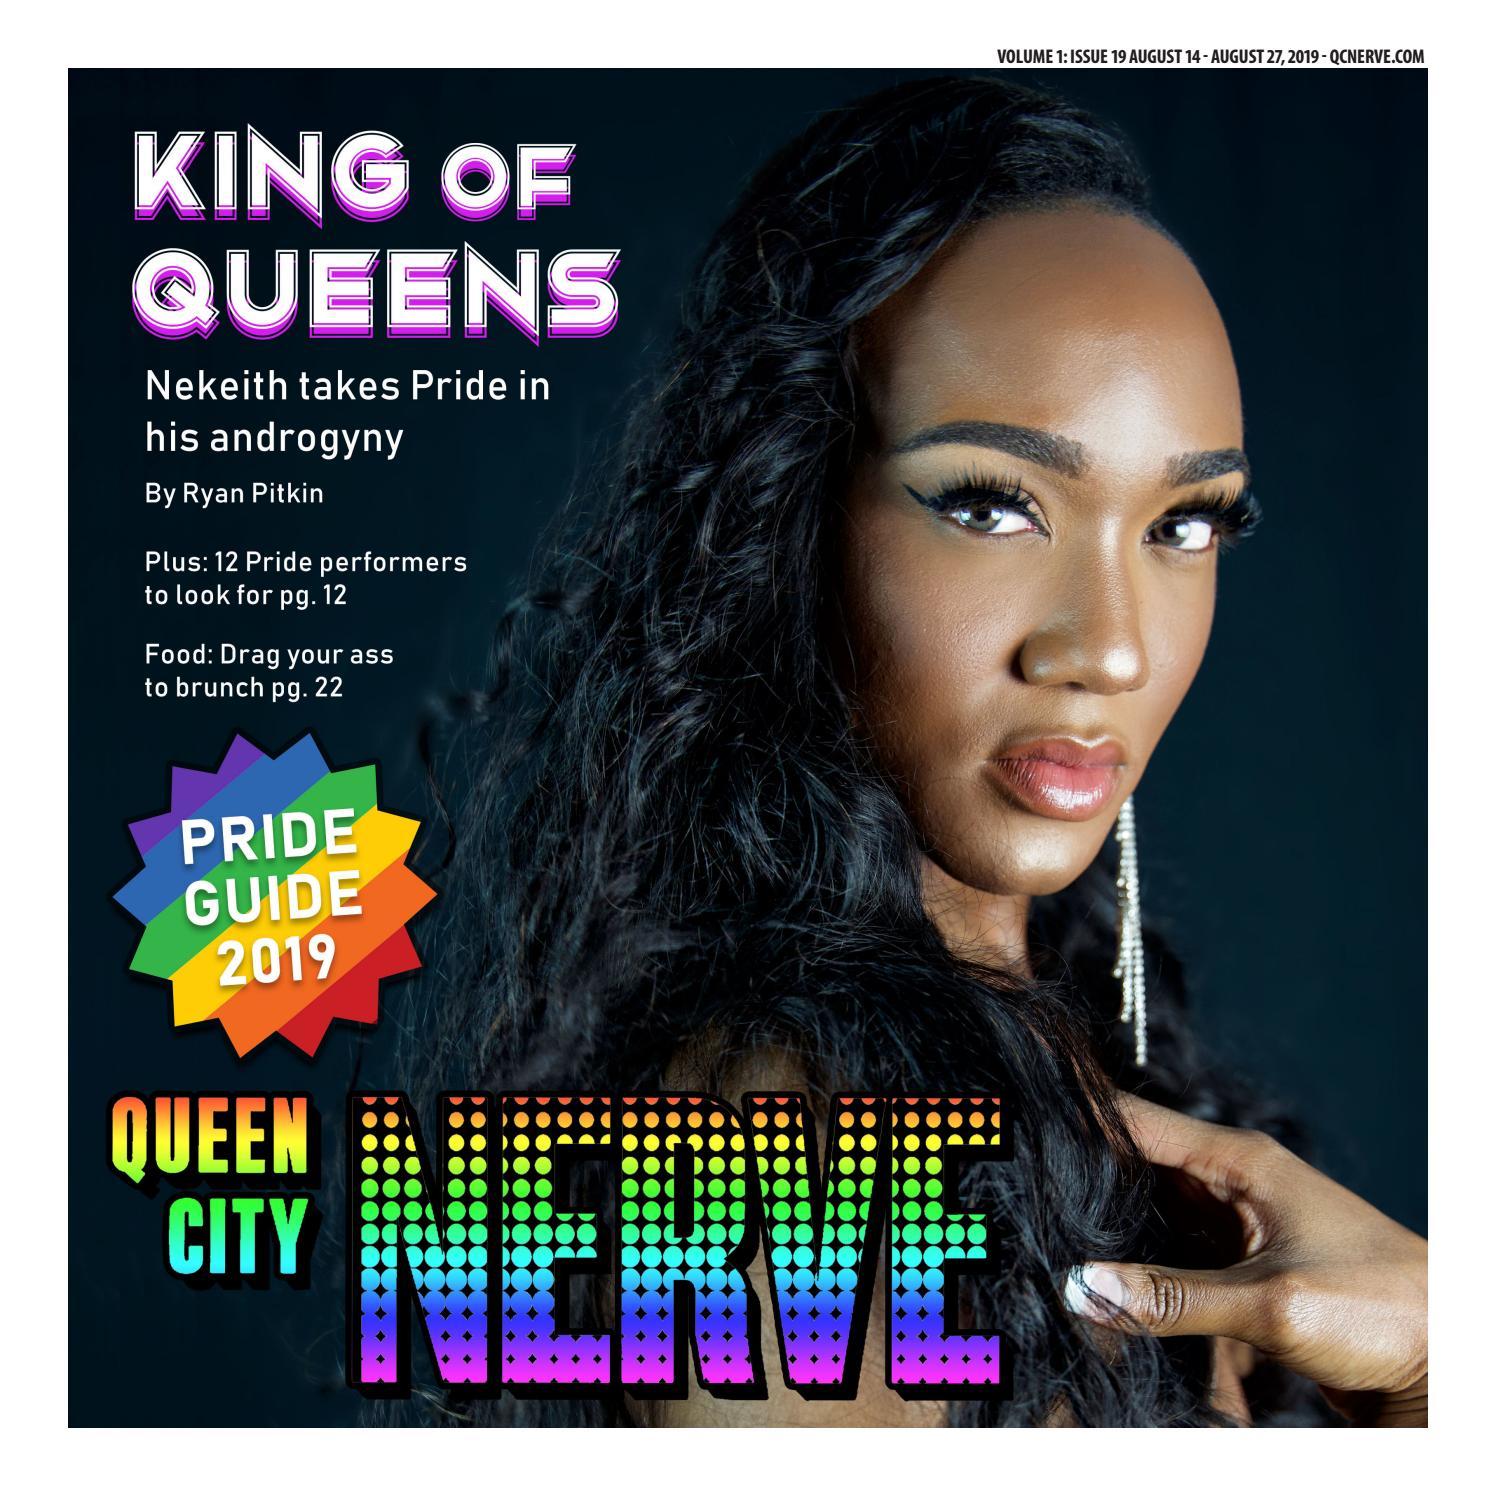 Actor Porno Madonna Sorry queen city nerve issue 19_2019queen city nerve - issuu